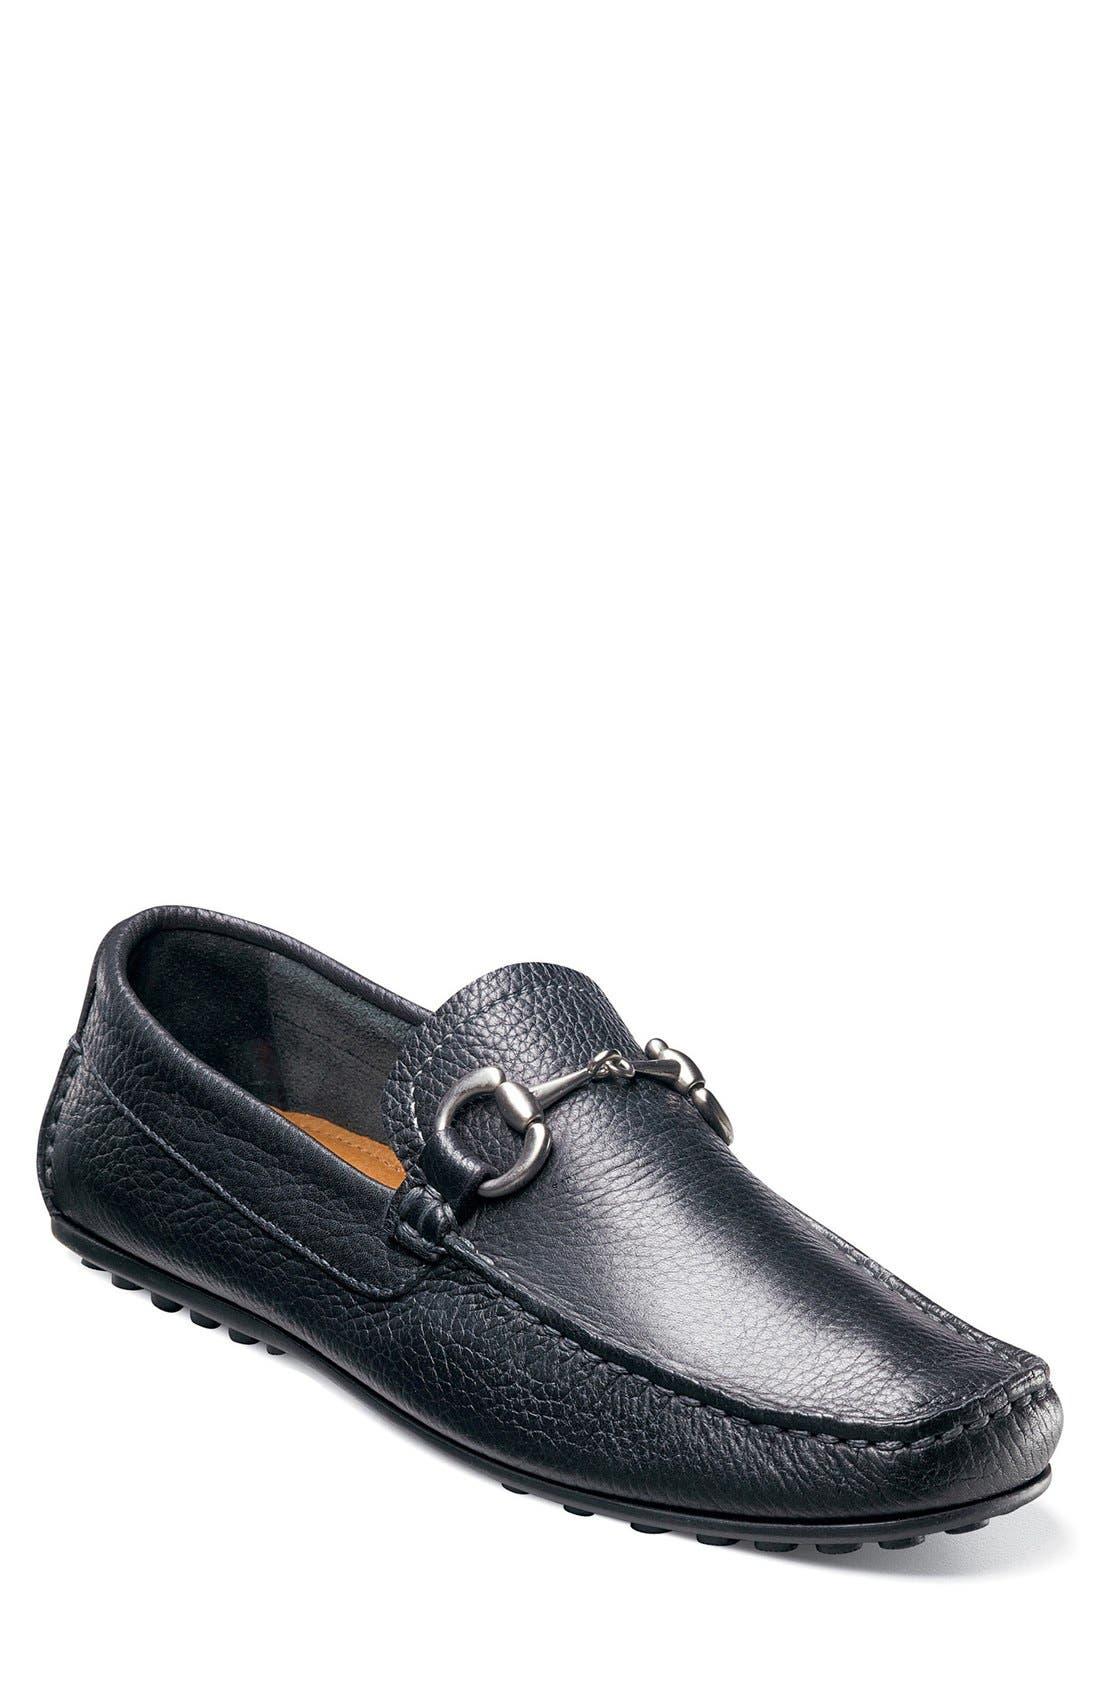 'Danforth' Driving Shoe,                             Main thumbnail 1, color,                             BLACK LEATHER